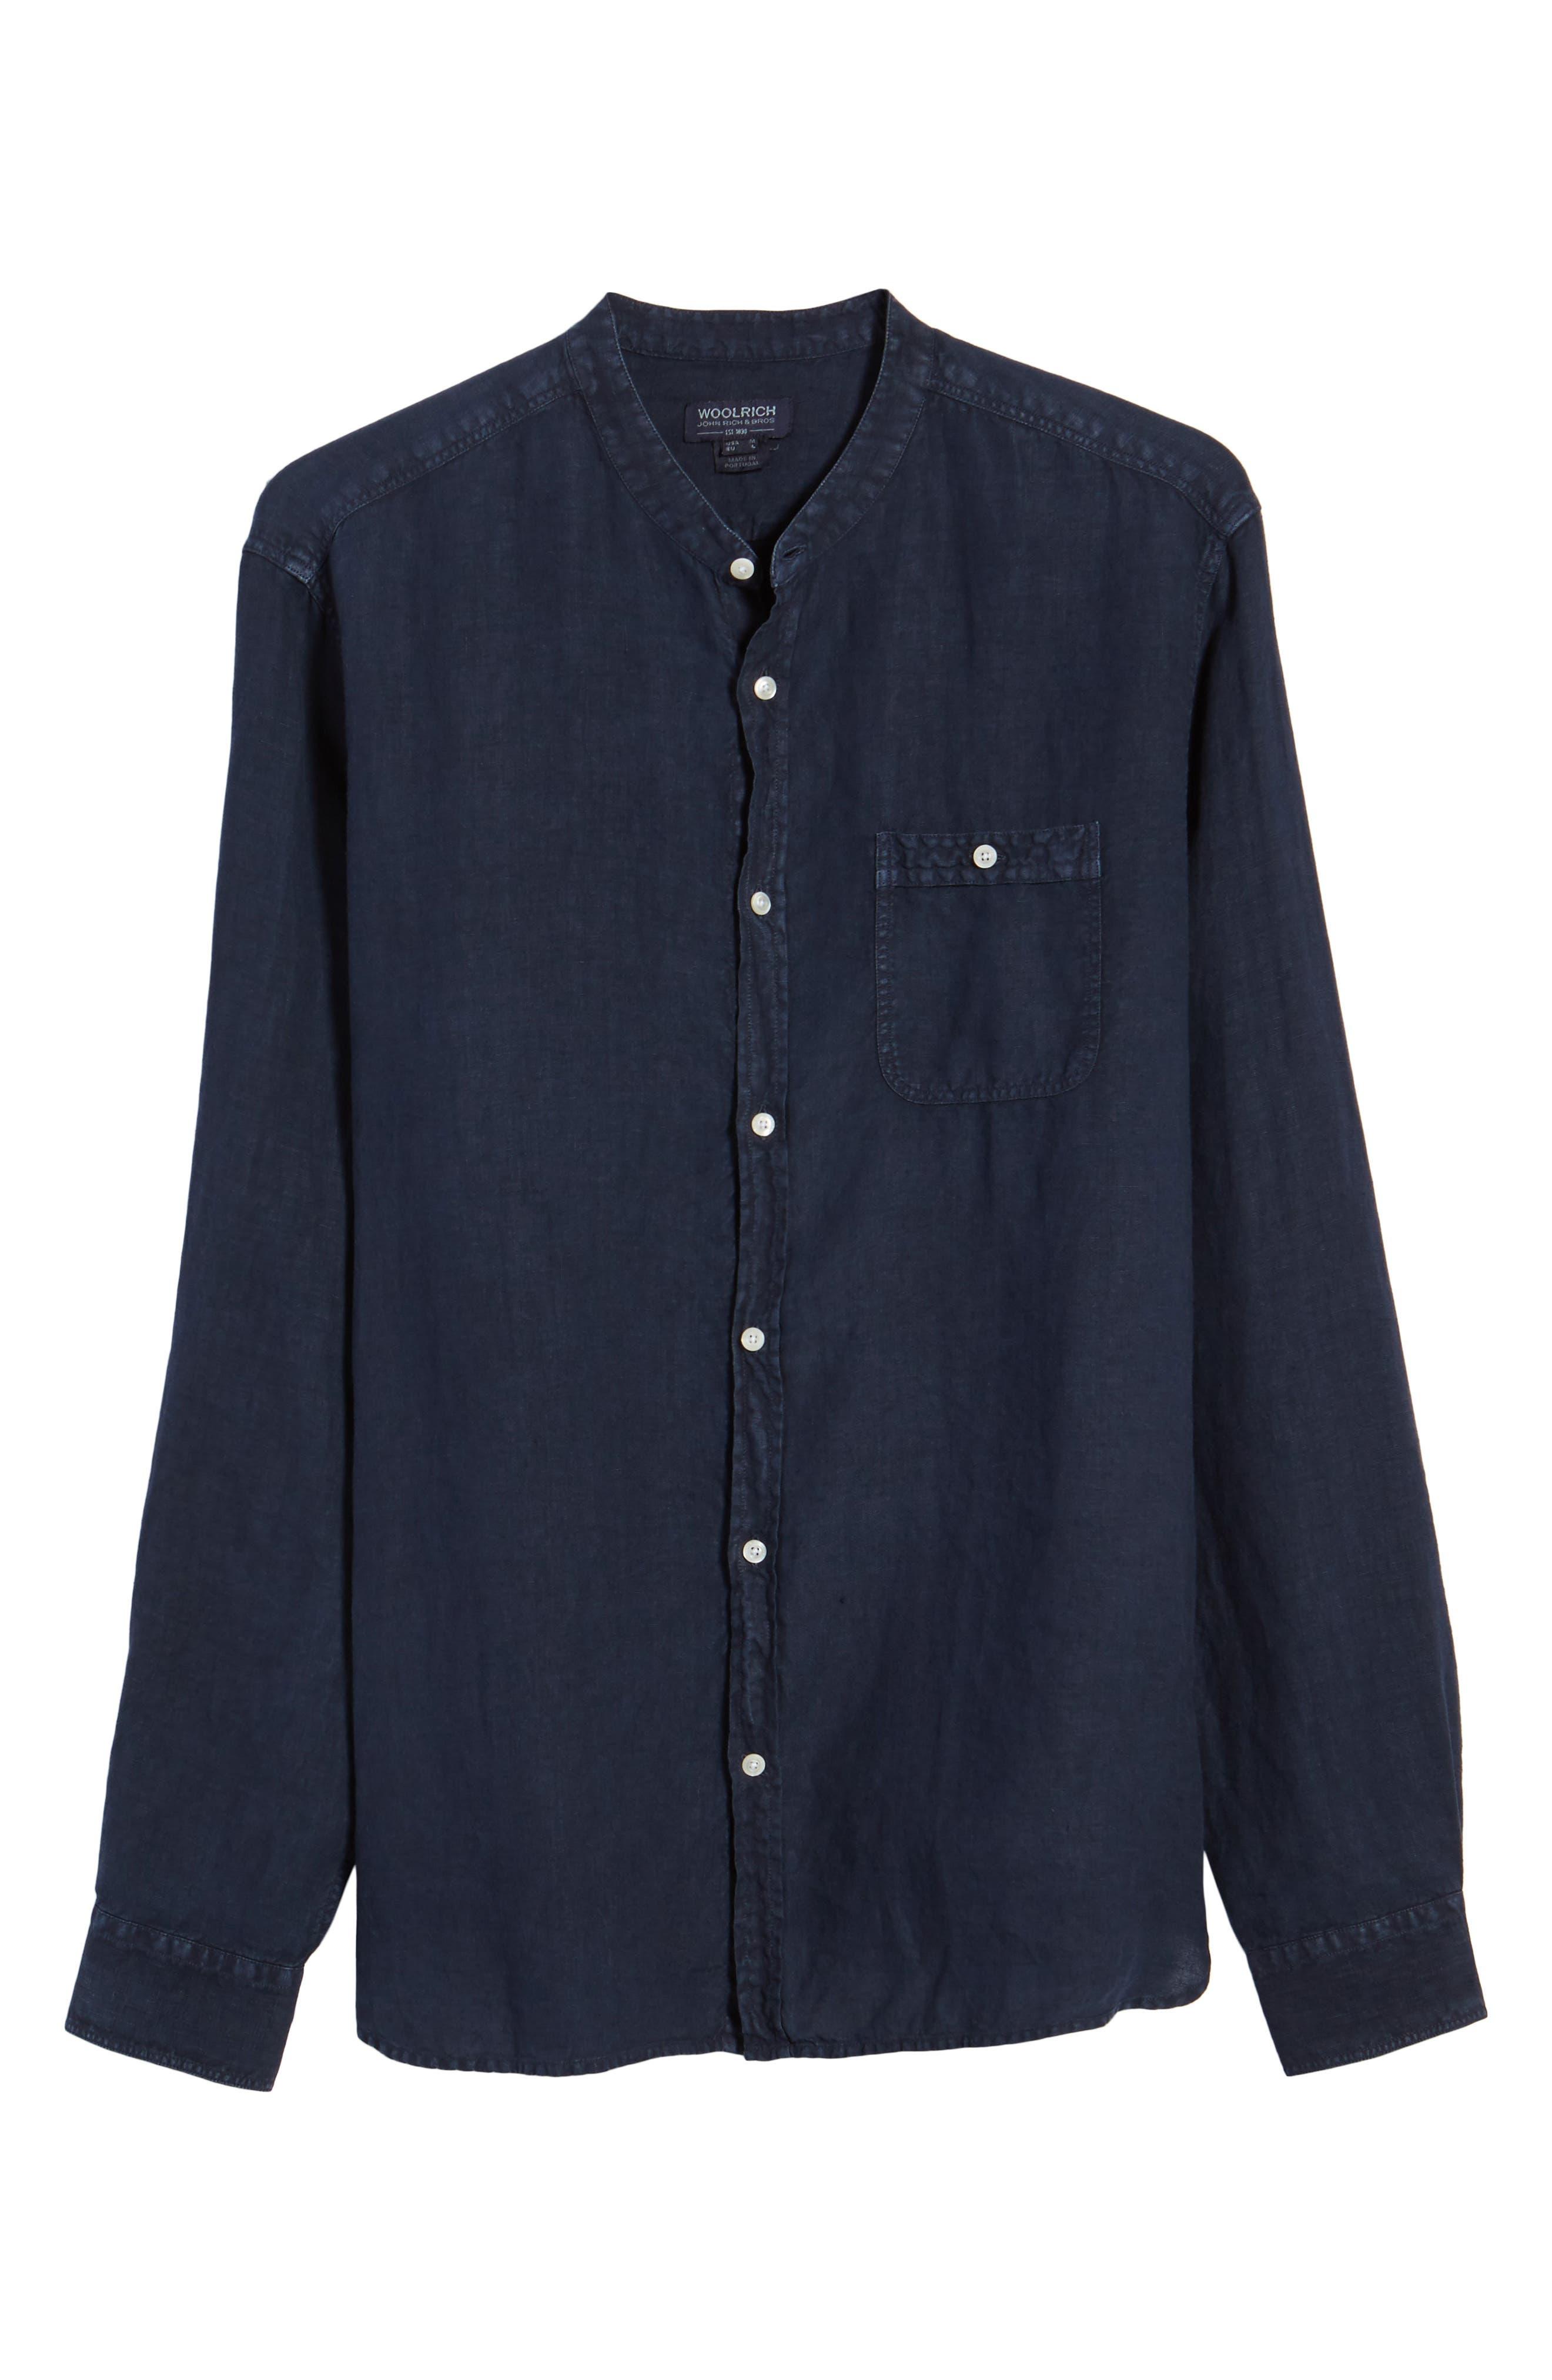 & Bros. Regular Fit Band Collar Linen Shirt,                             Alternate thumbnail 6, color,                             Mood Indigo